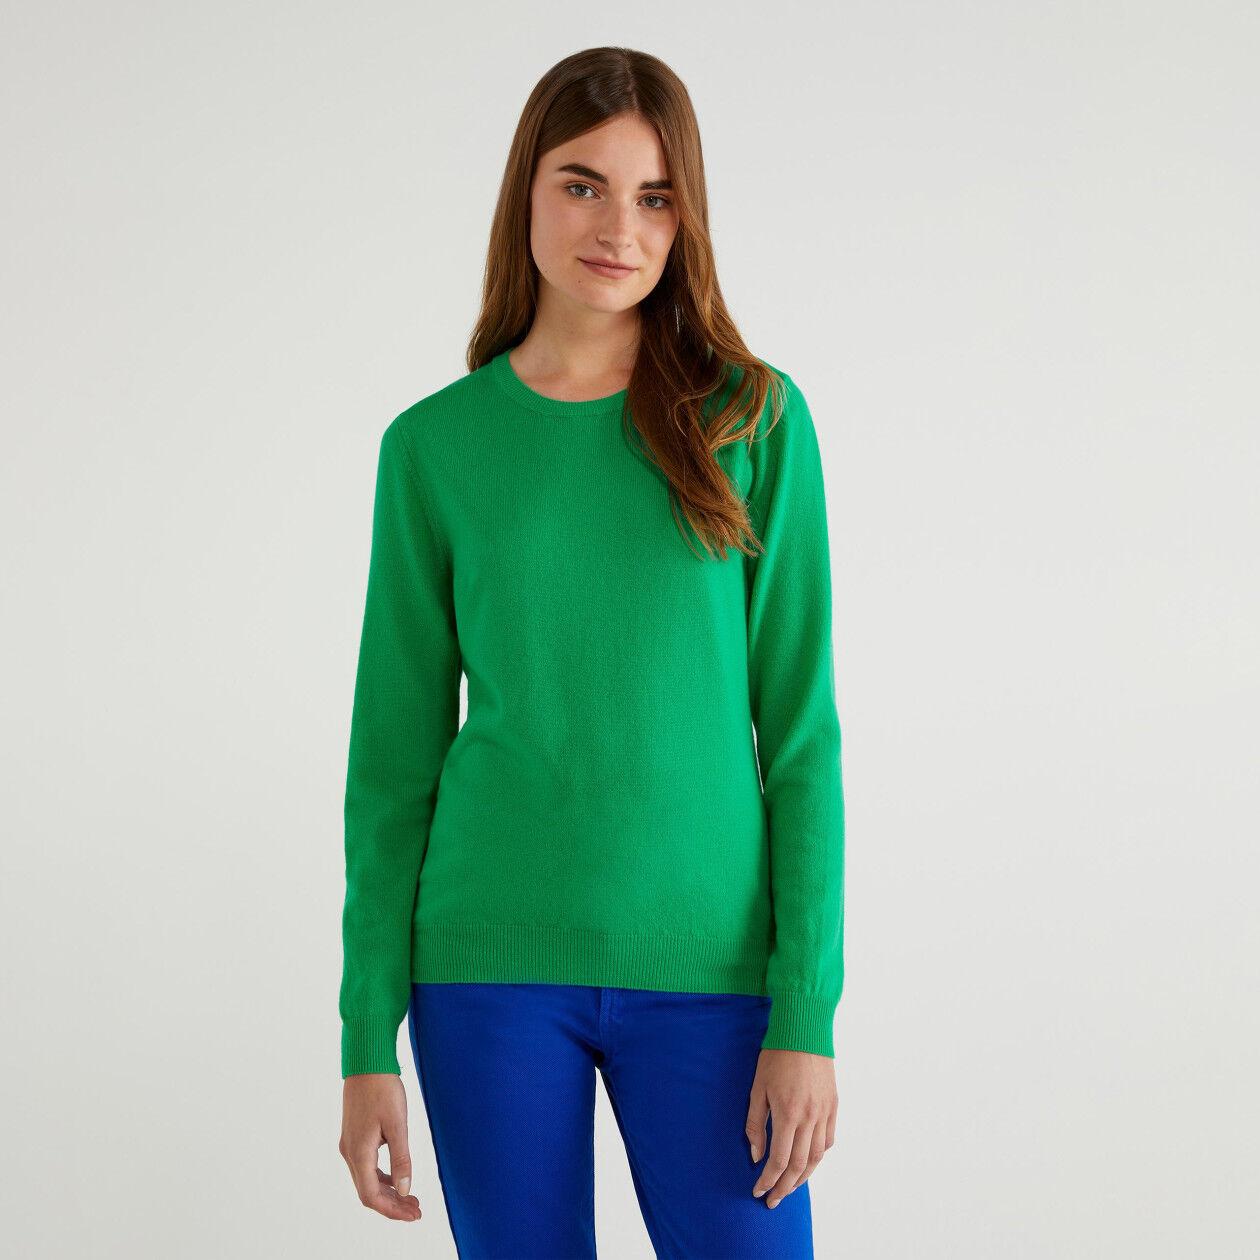 Camisola de gola redonda 100% lã virgem